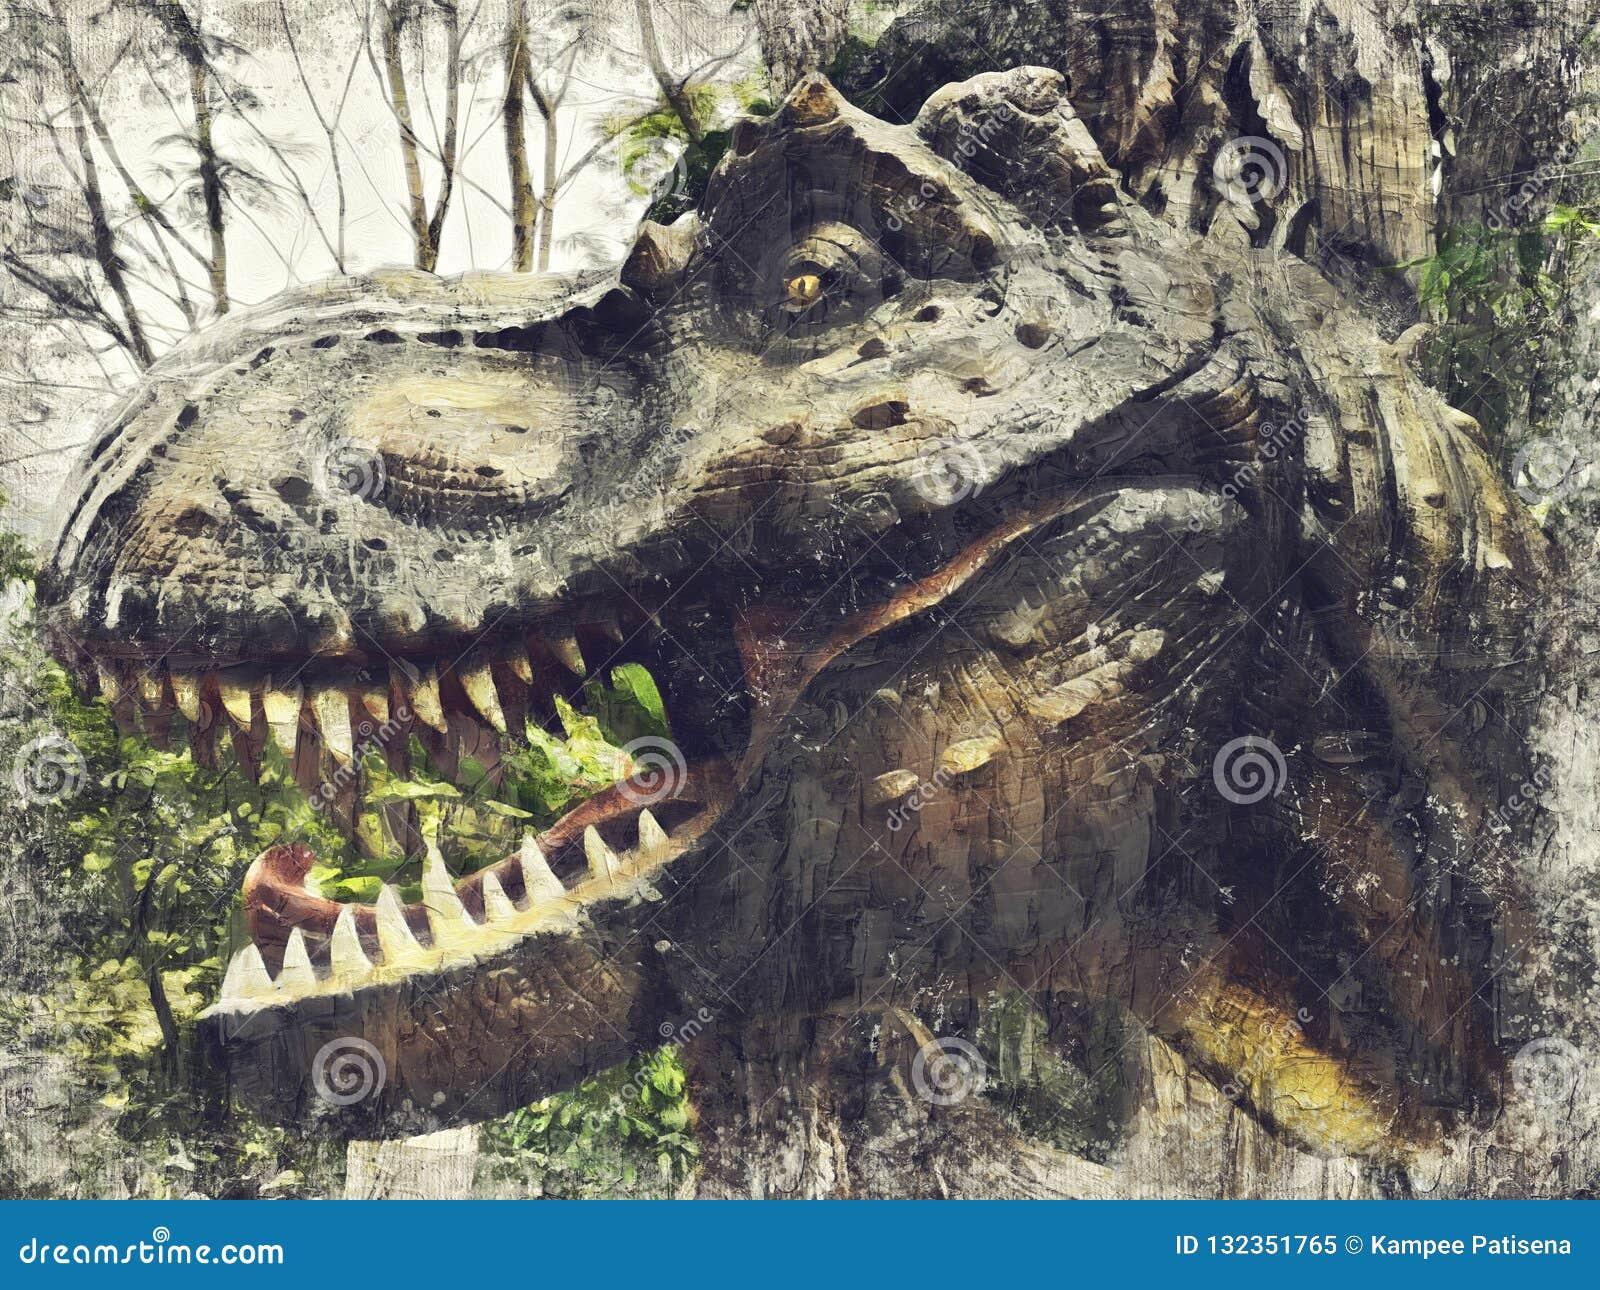 Tyrannosarie Rex, T-REX Digital Art Impasto Oil Painting Abstr